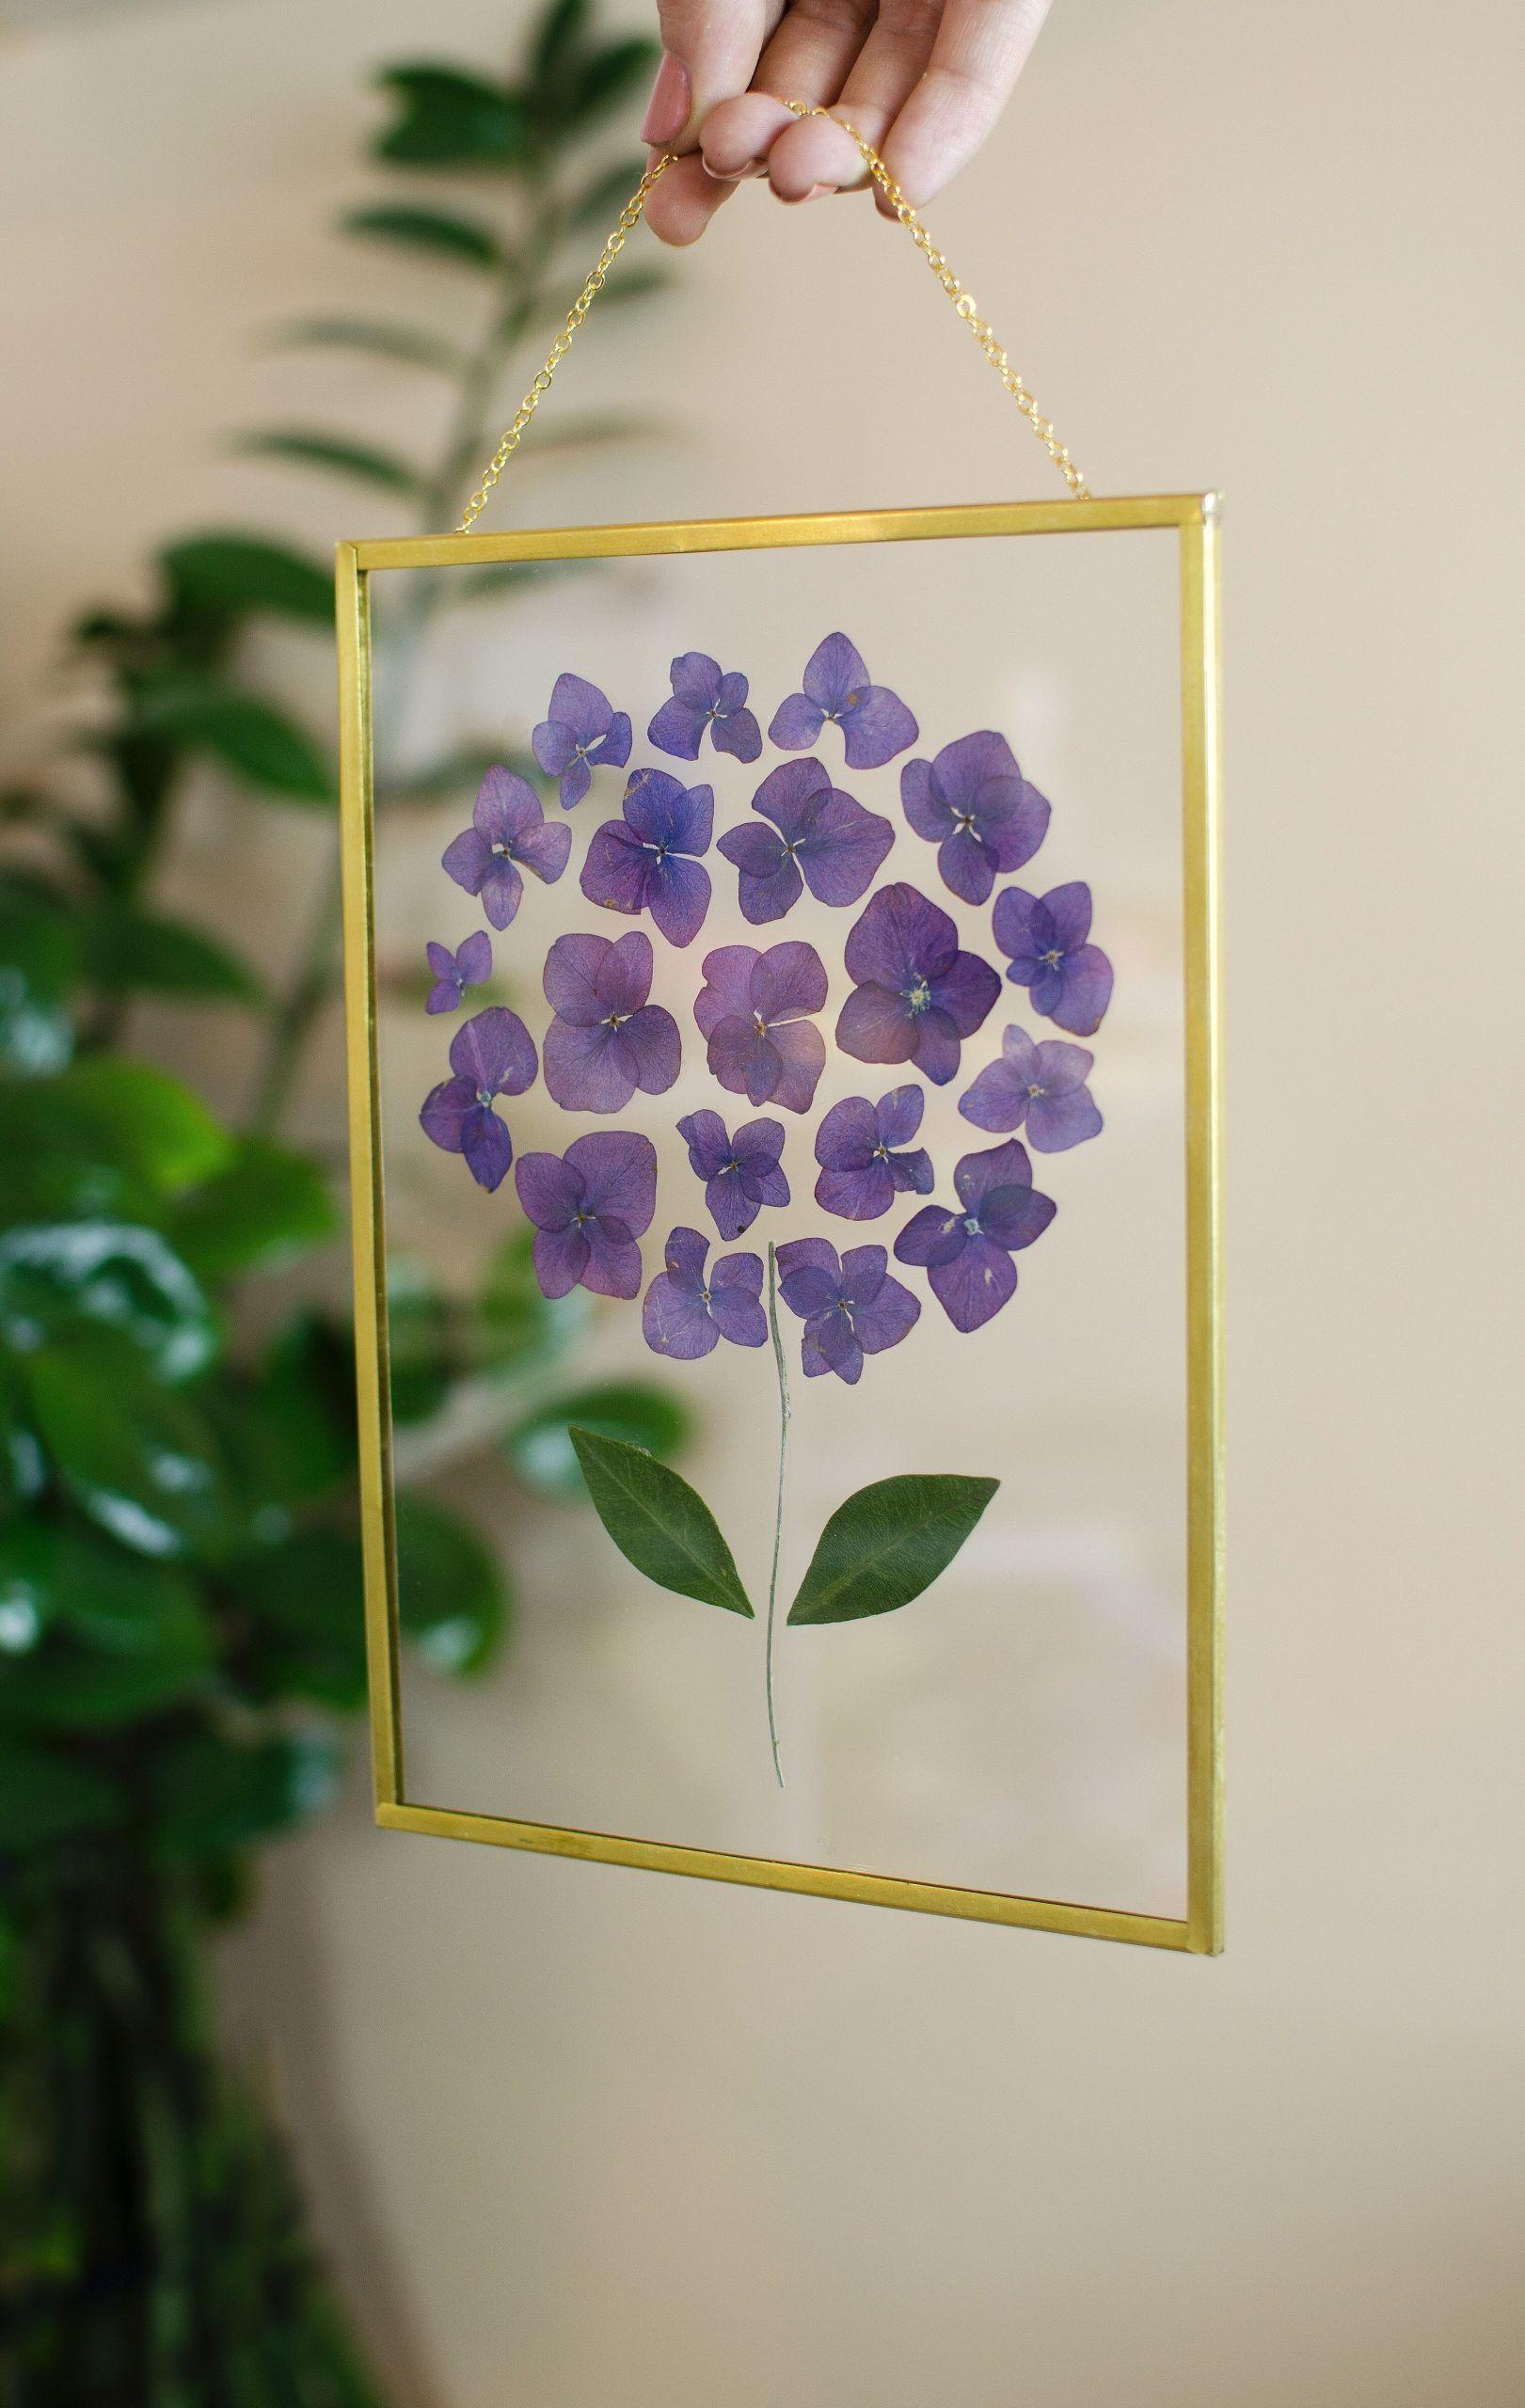 Pressed Flower Frame Flower Frame Pressed Pressed Flowers Diy Pressed Flowers Frame Pressed Flower Crafts